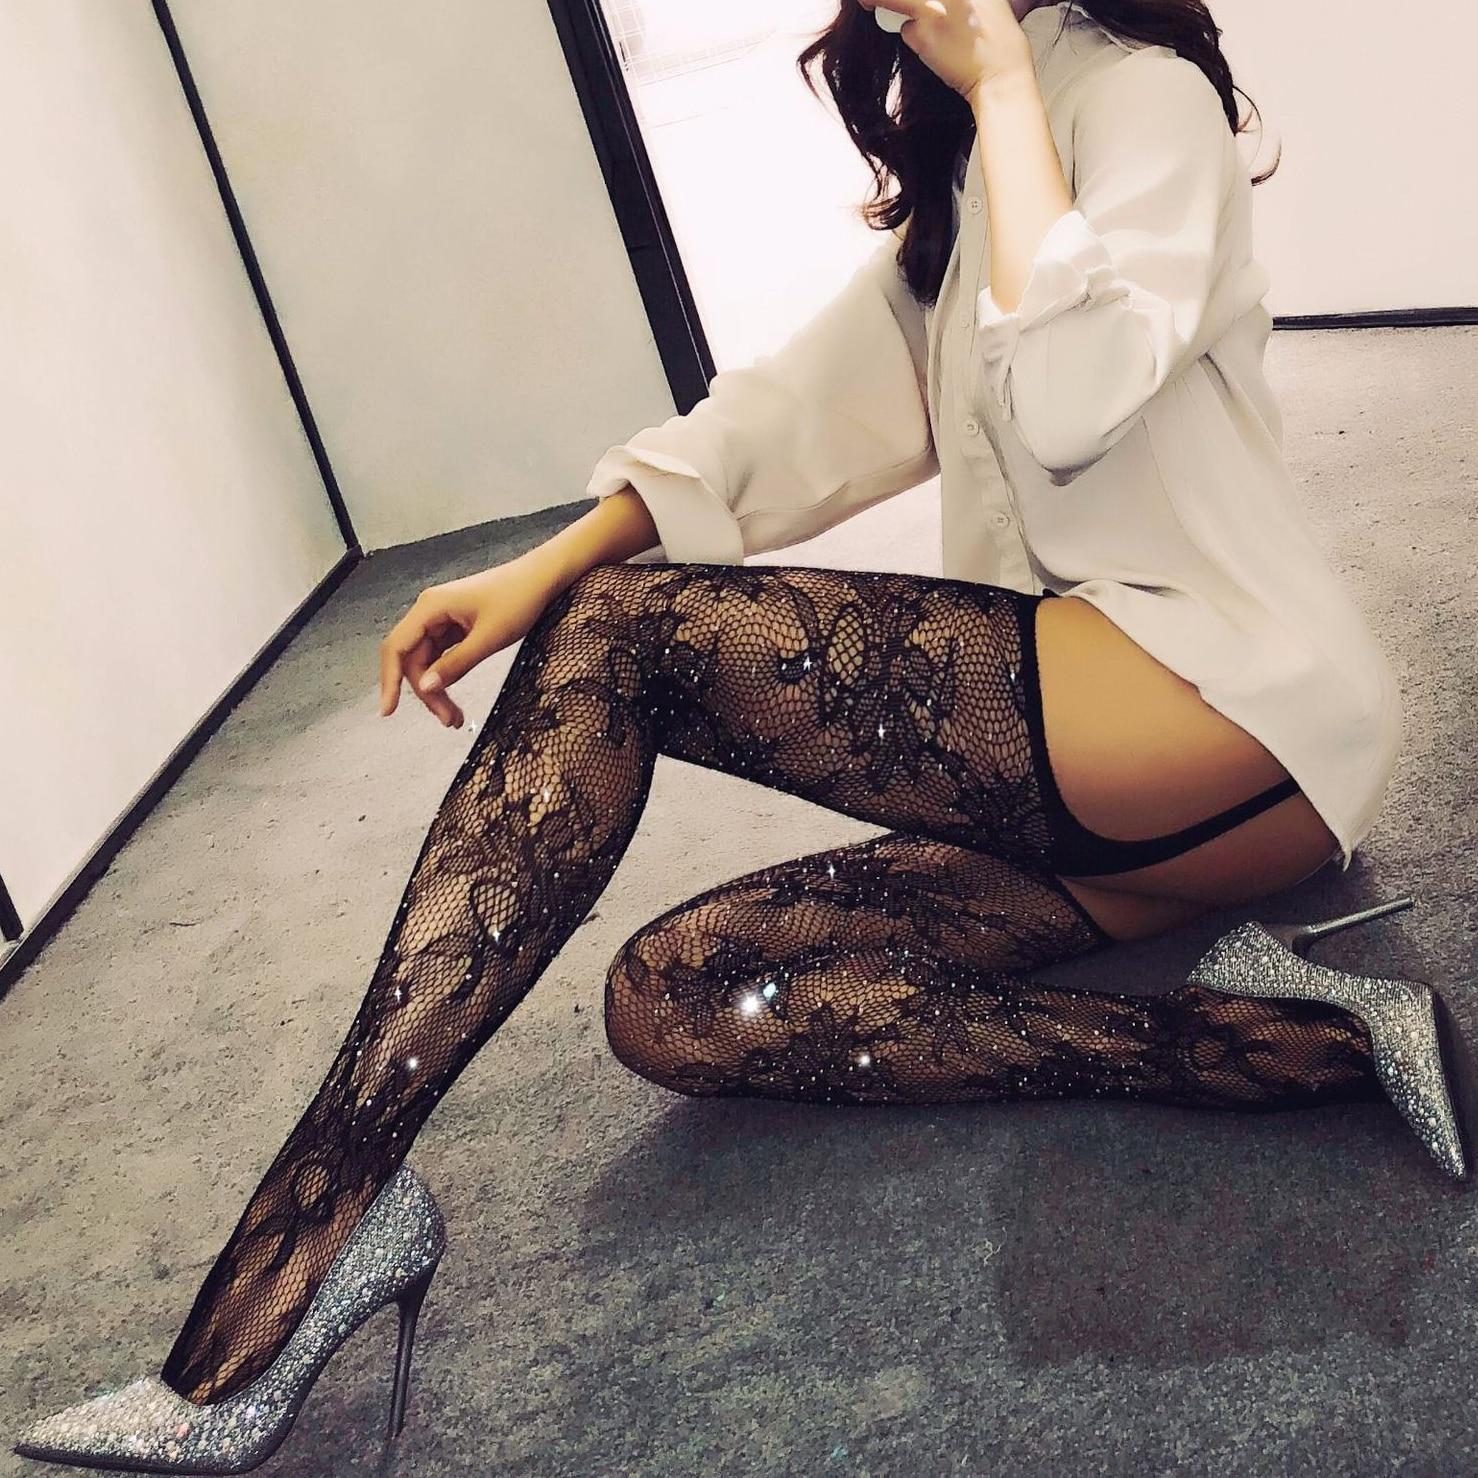 Tights With Rhinestone Sexy Women Stockings Fishnet Pantyhose Shiny Stockings Diamond Crystal Tights Carnival Hosiery